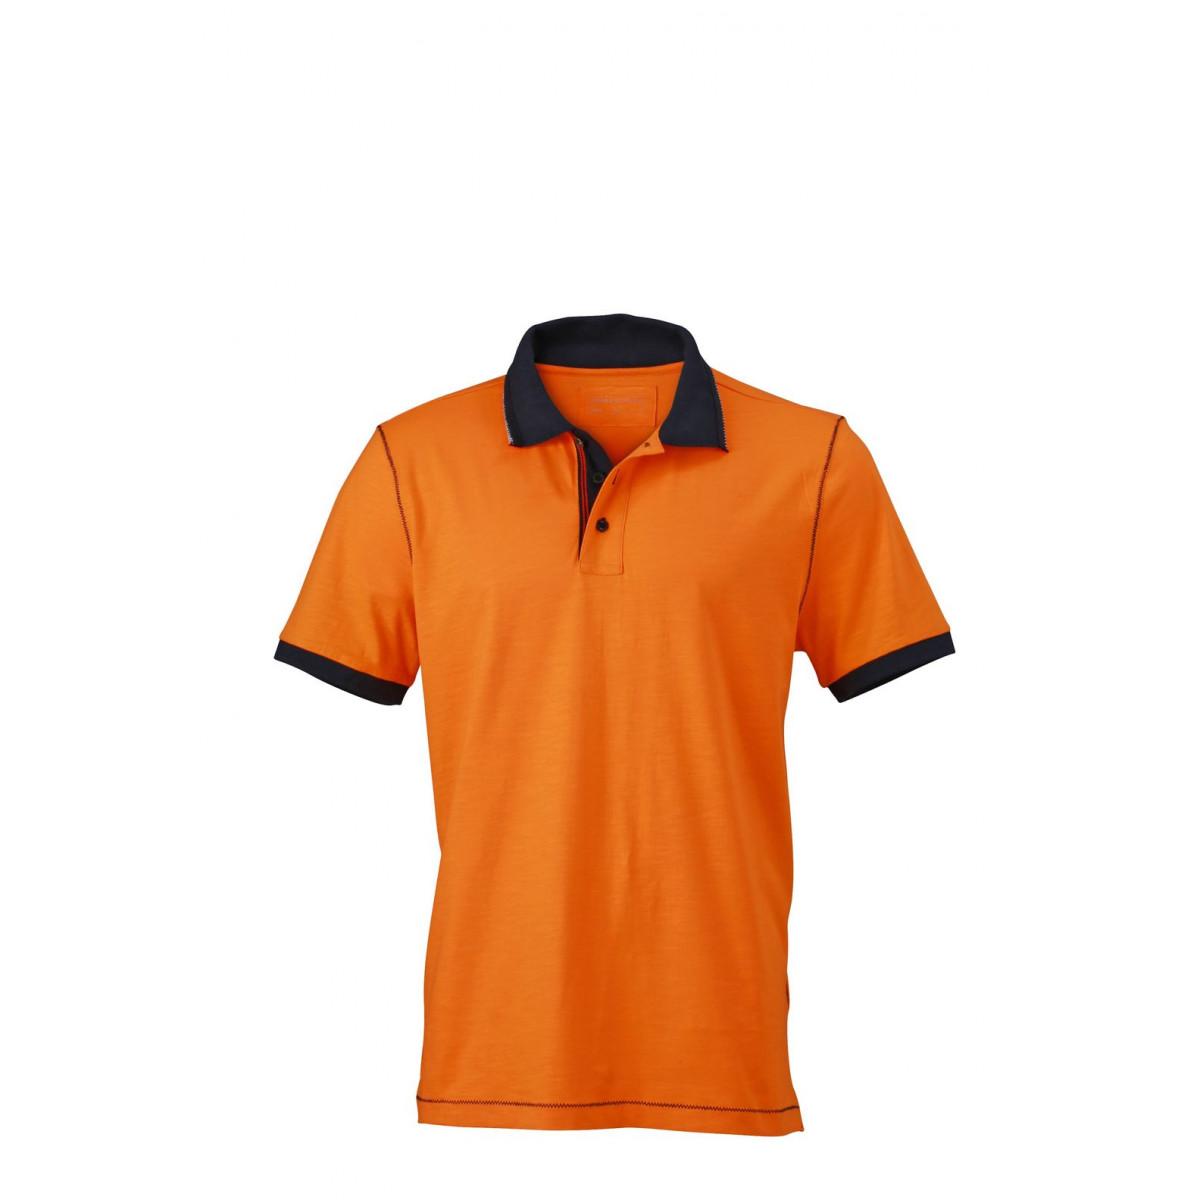 Рубашка поло мужская JN980 Mens Urban Polo - Оранжевый/Темно-синий